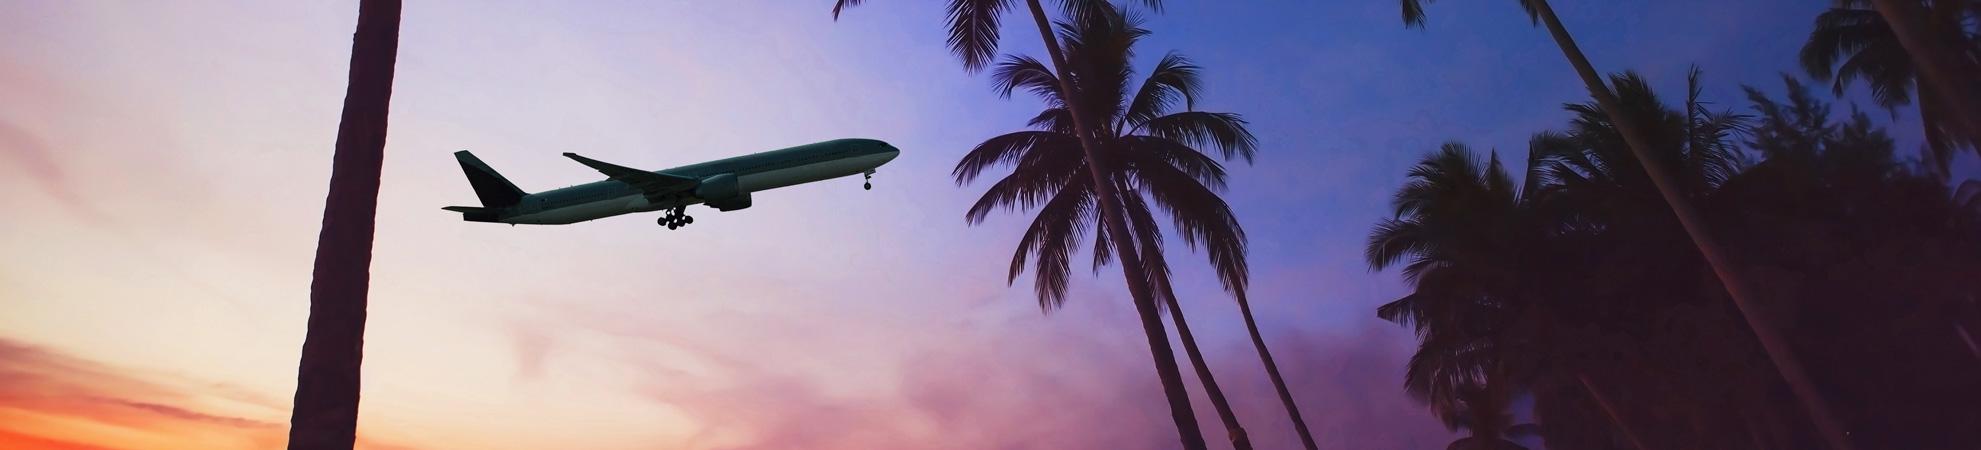 Aller à Bali en avion